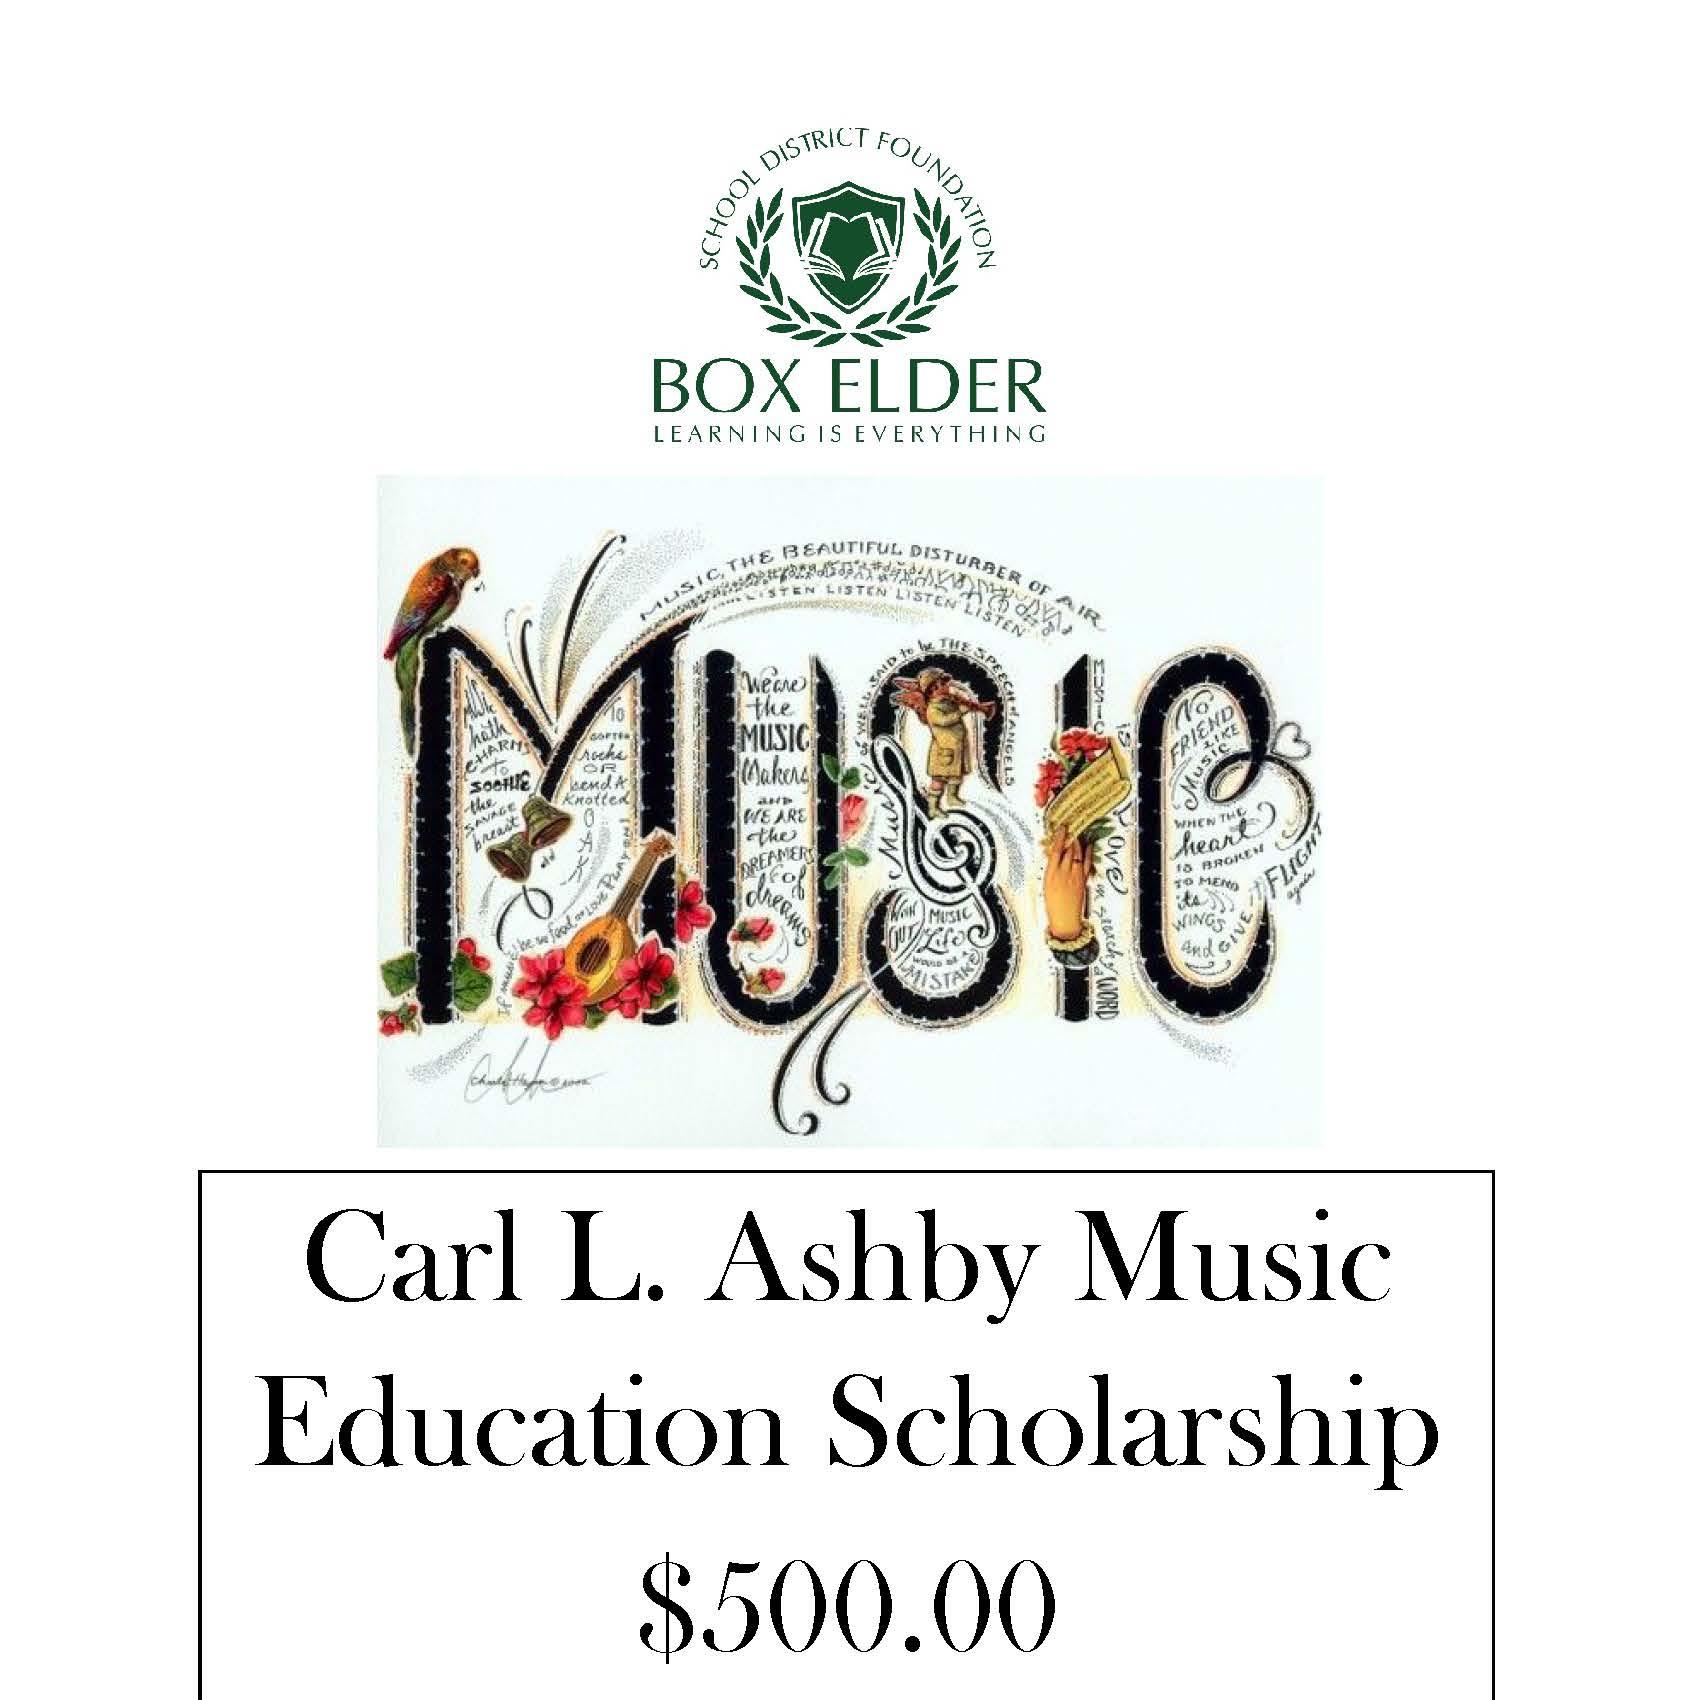 Carl L. Ashby Music Education Scholarship